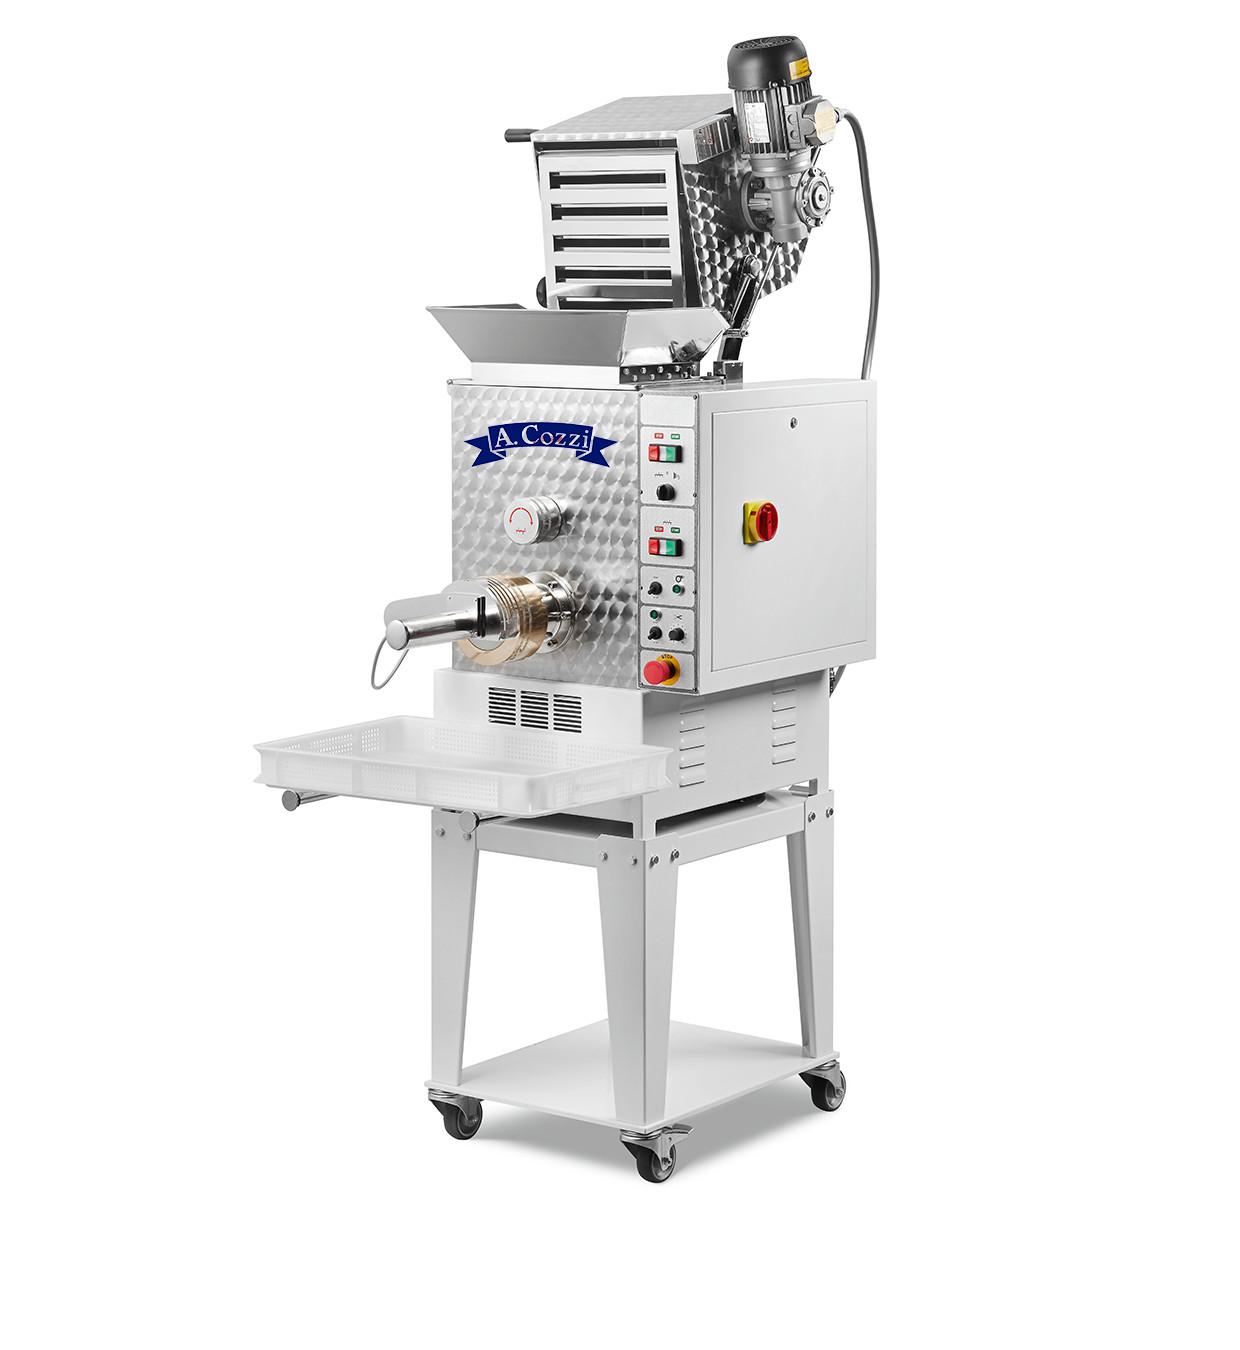 Pasta extruder machine mod. PC 110 DV